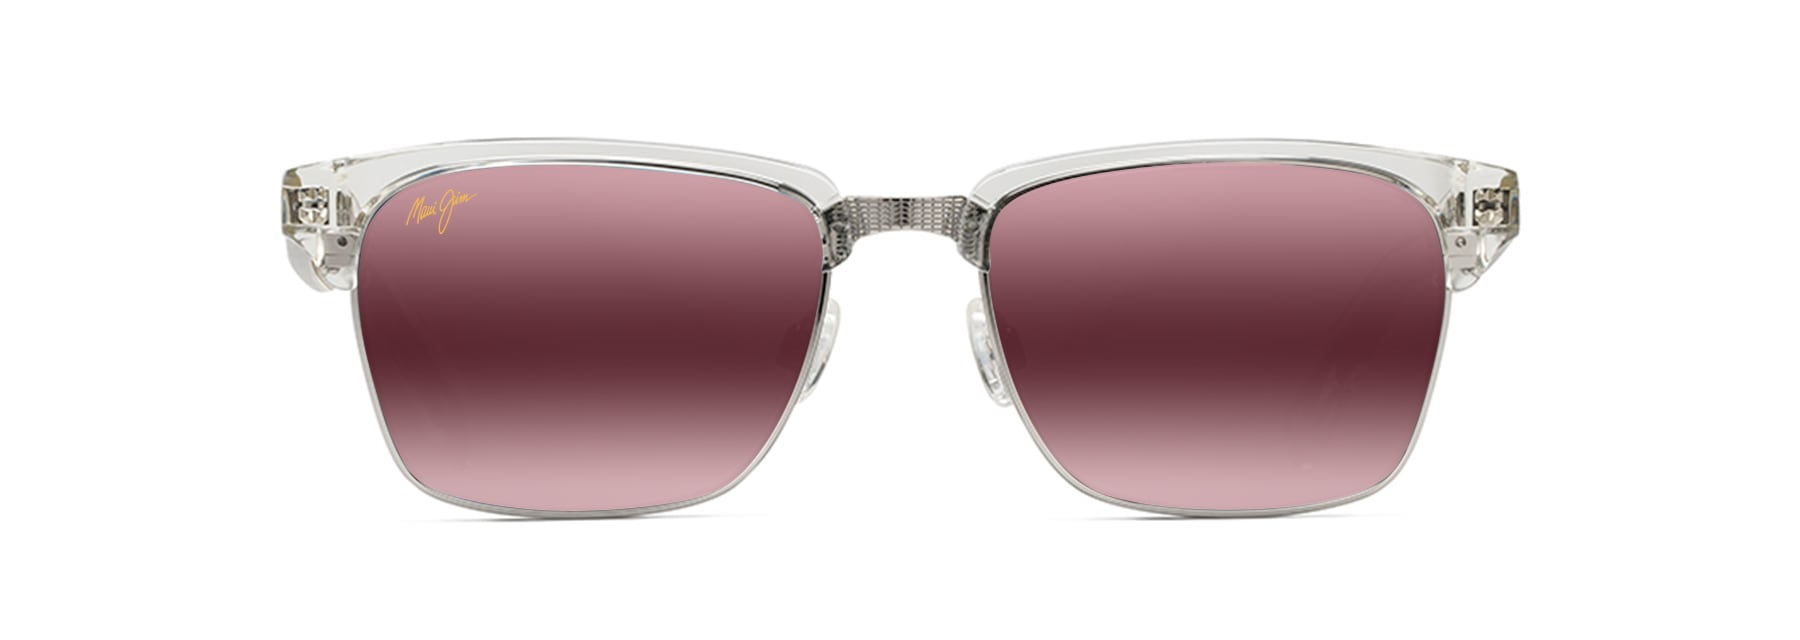 bac837a7851 Custom Kawika Polarized Sunglasses